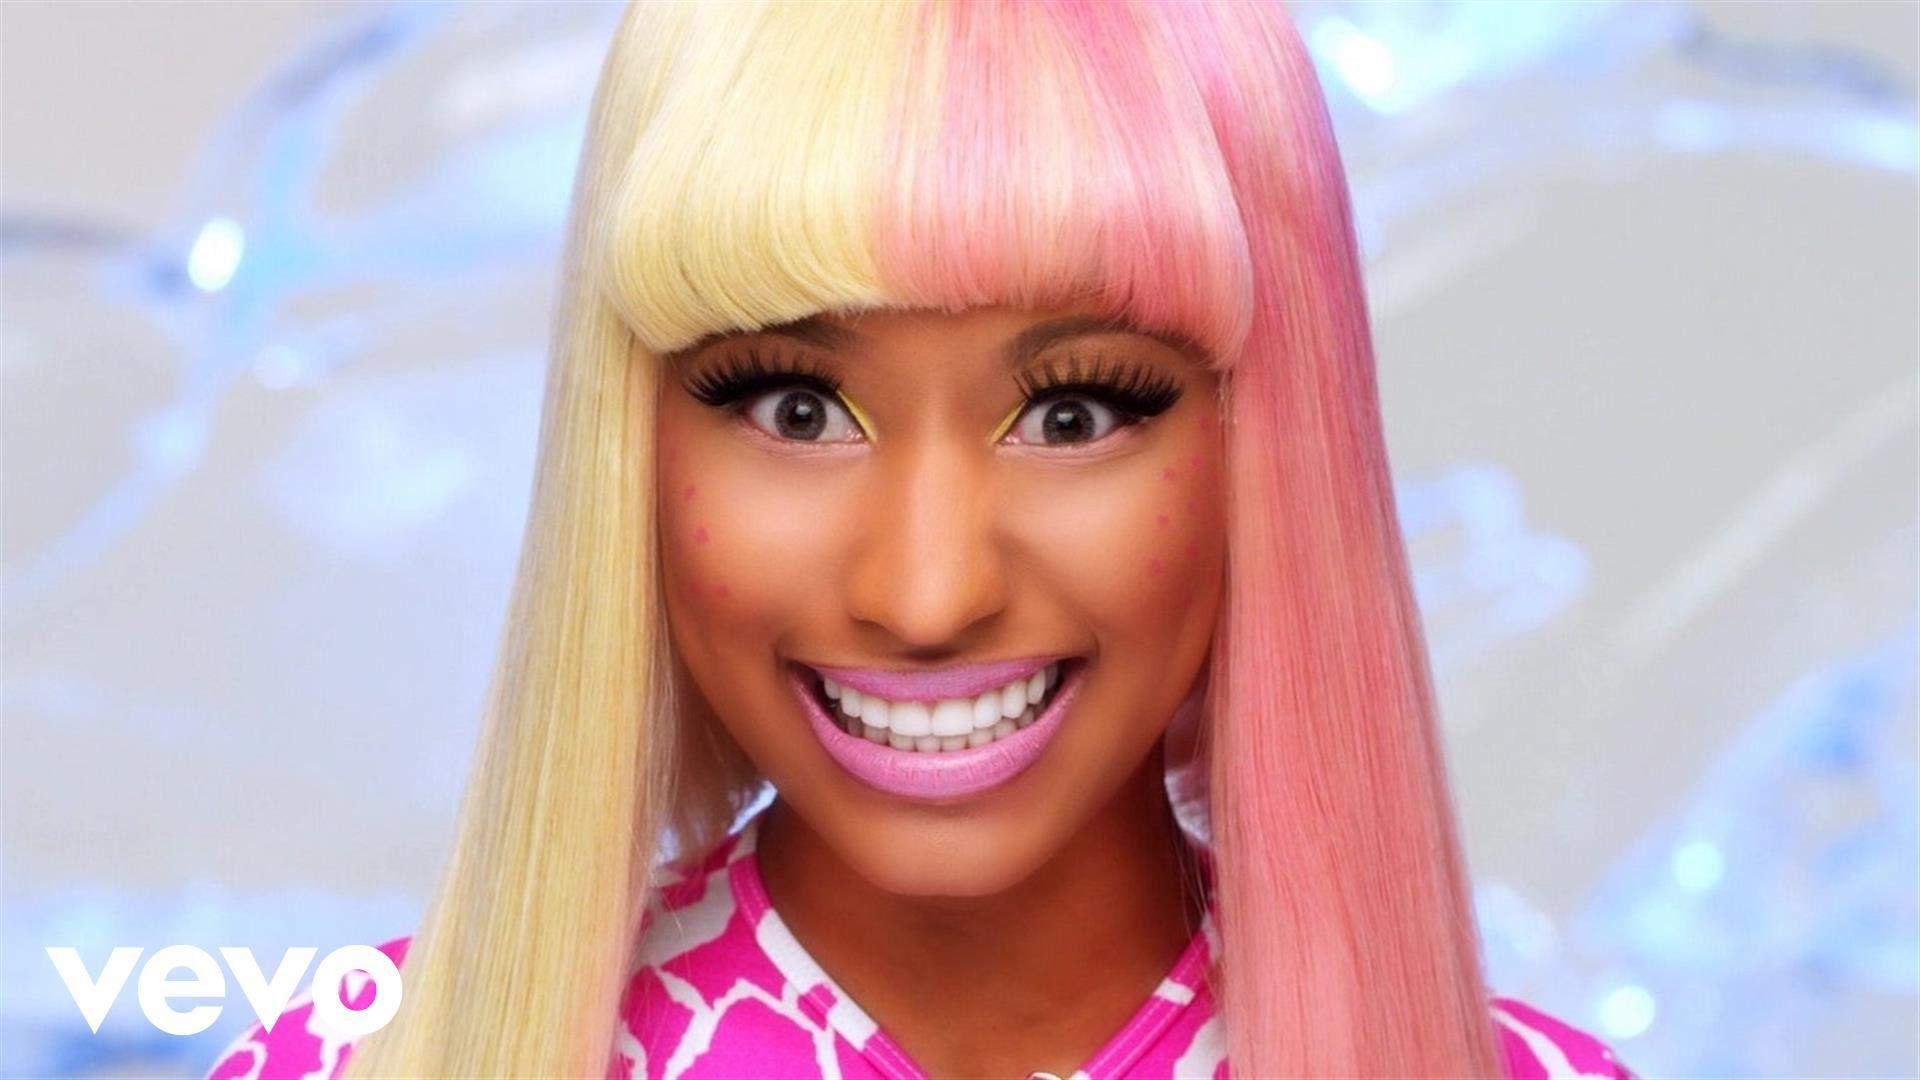 Nicki Minaj HQ wallpapers